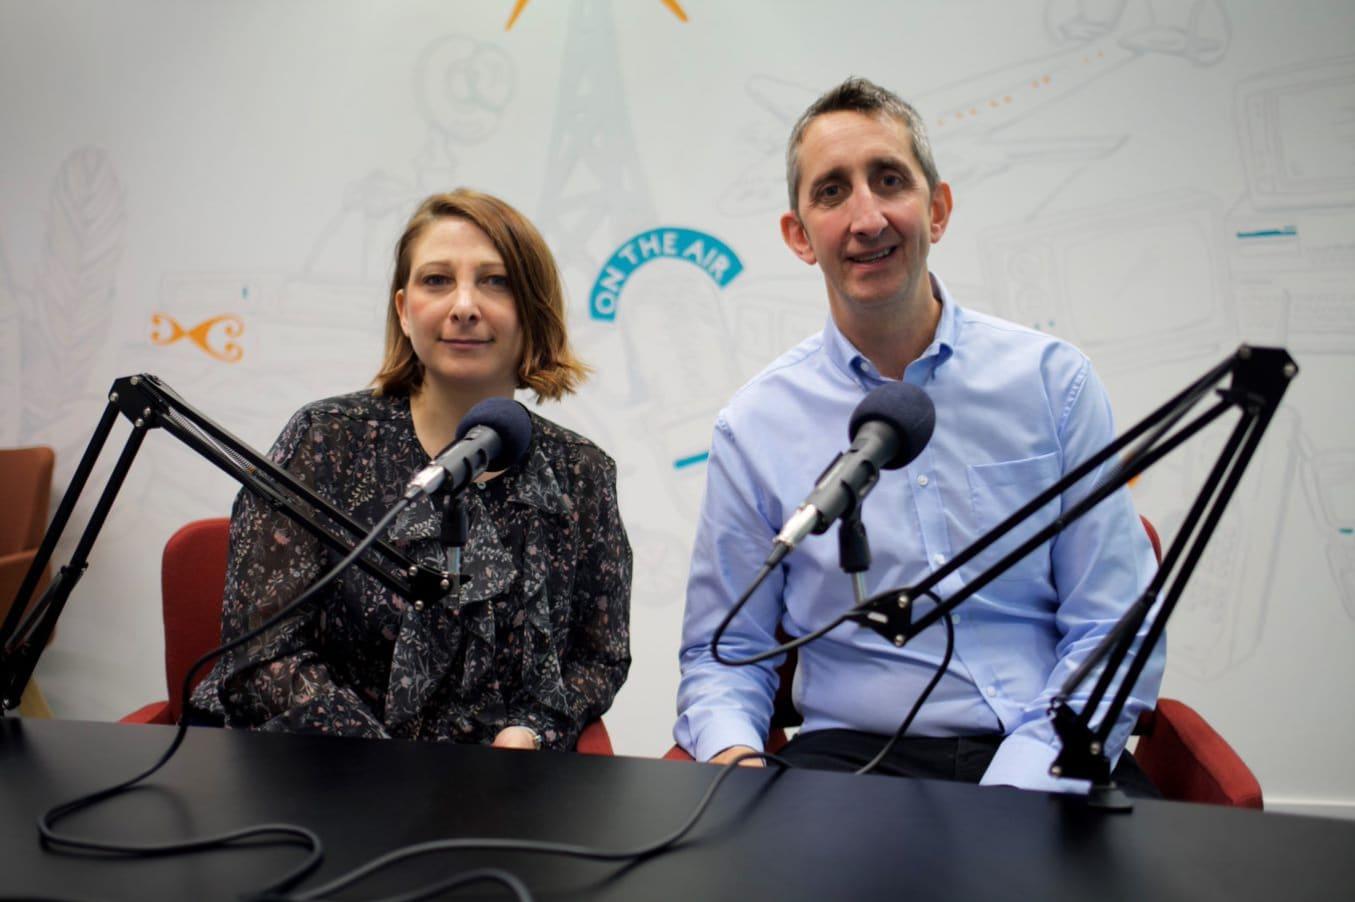 Kevin Edwards mit Kate Knight am Mikrofon